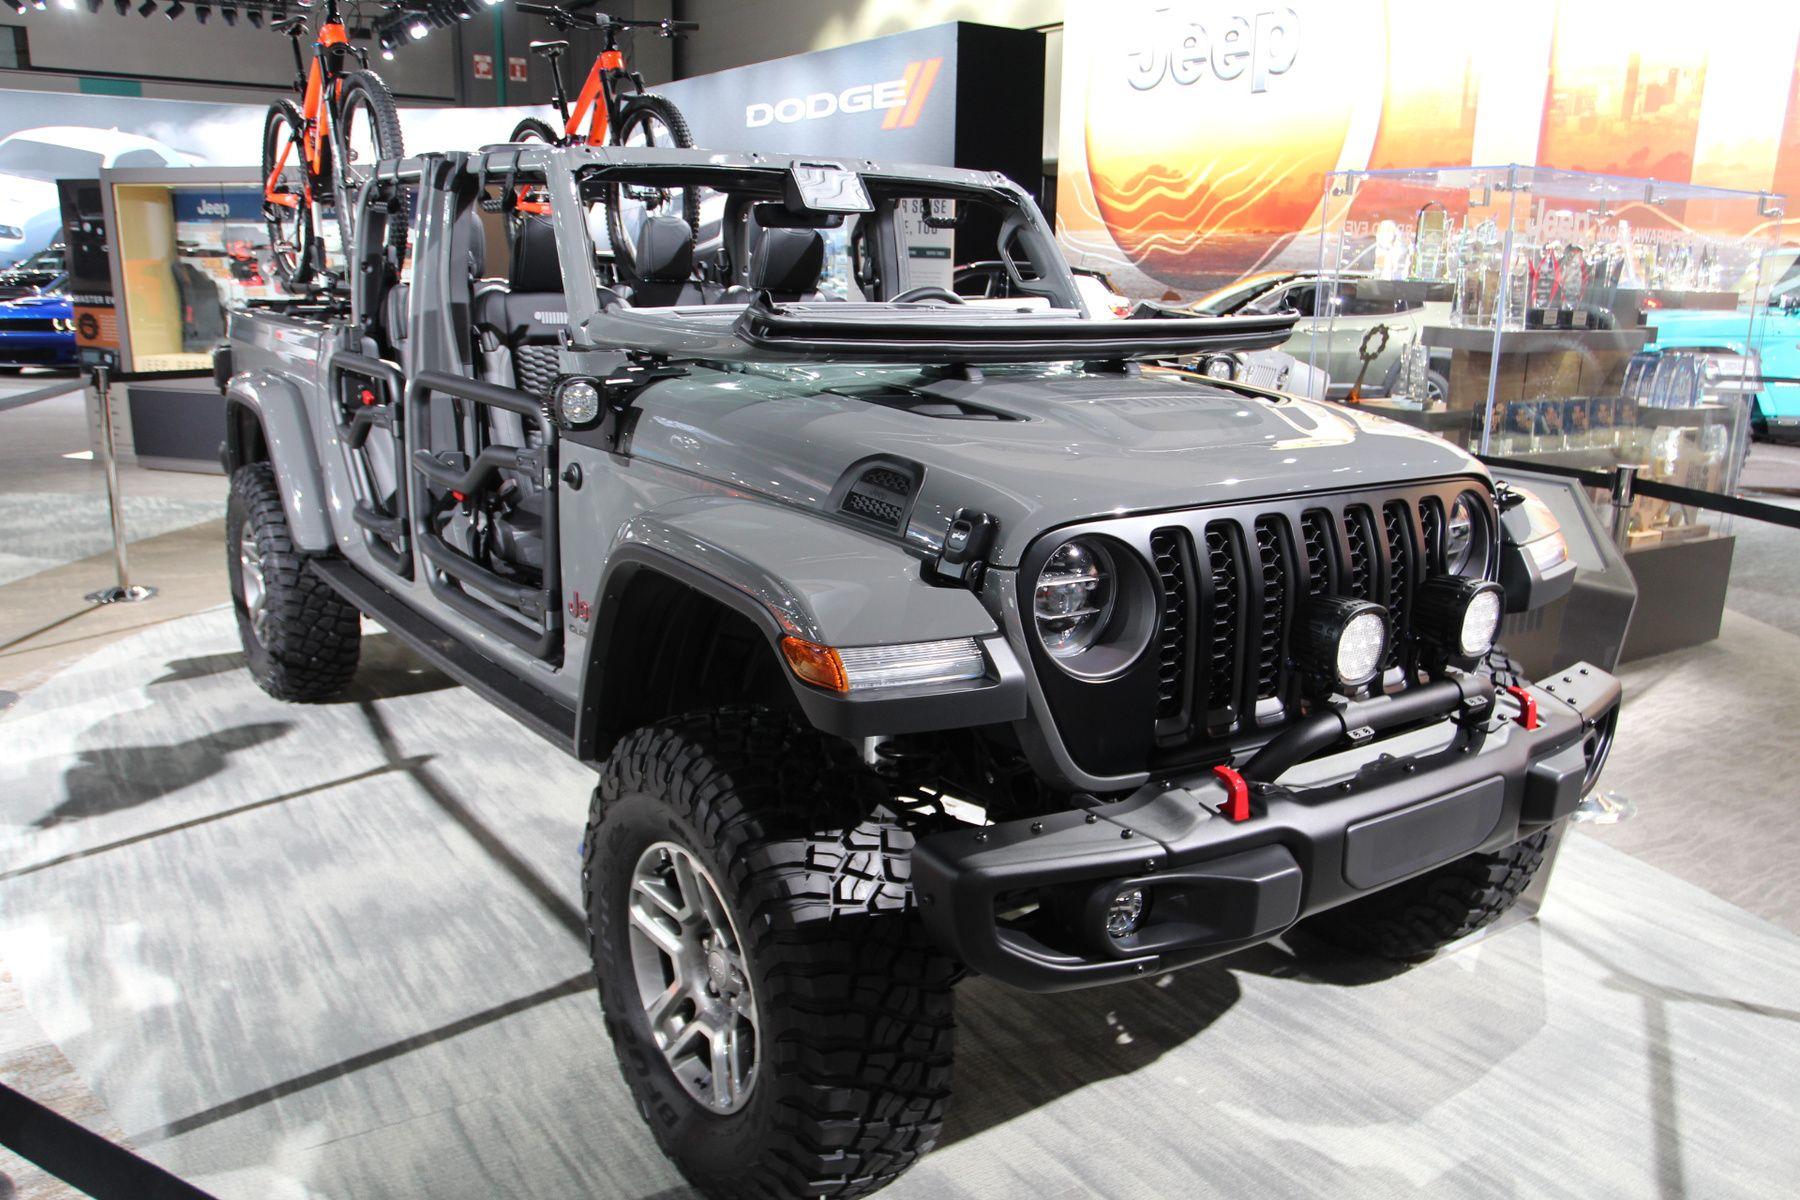 O Lenne Itt Gladiator A Jeep Uj Pickupja Jeep Jeep Gladiator